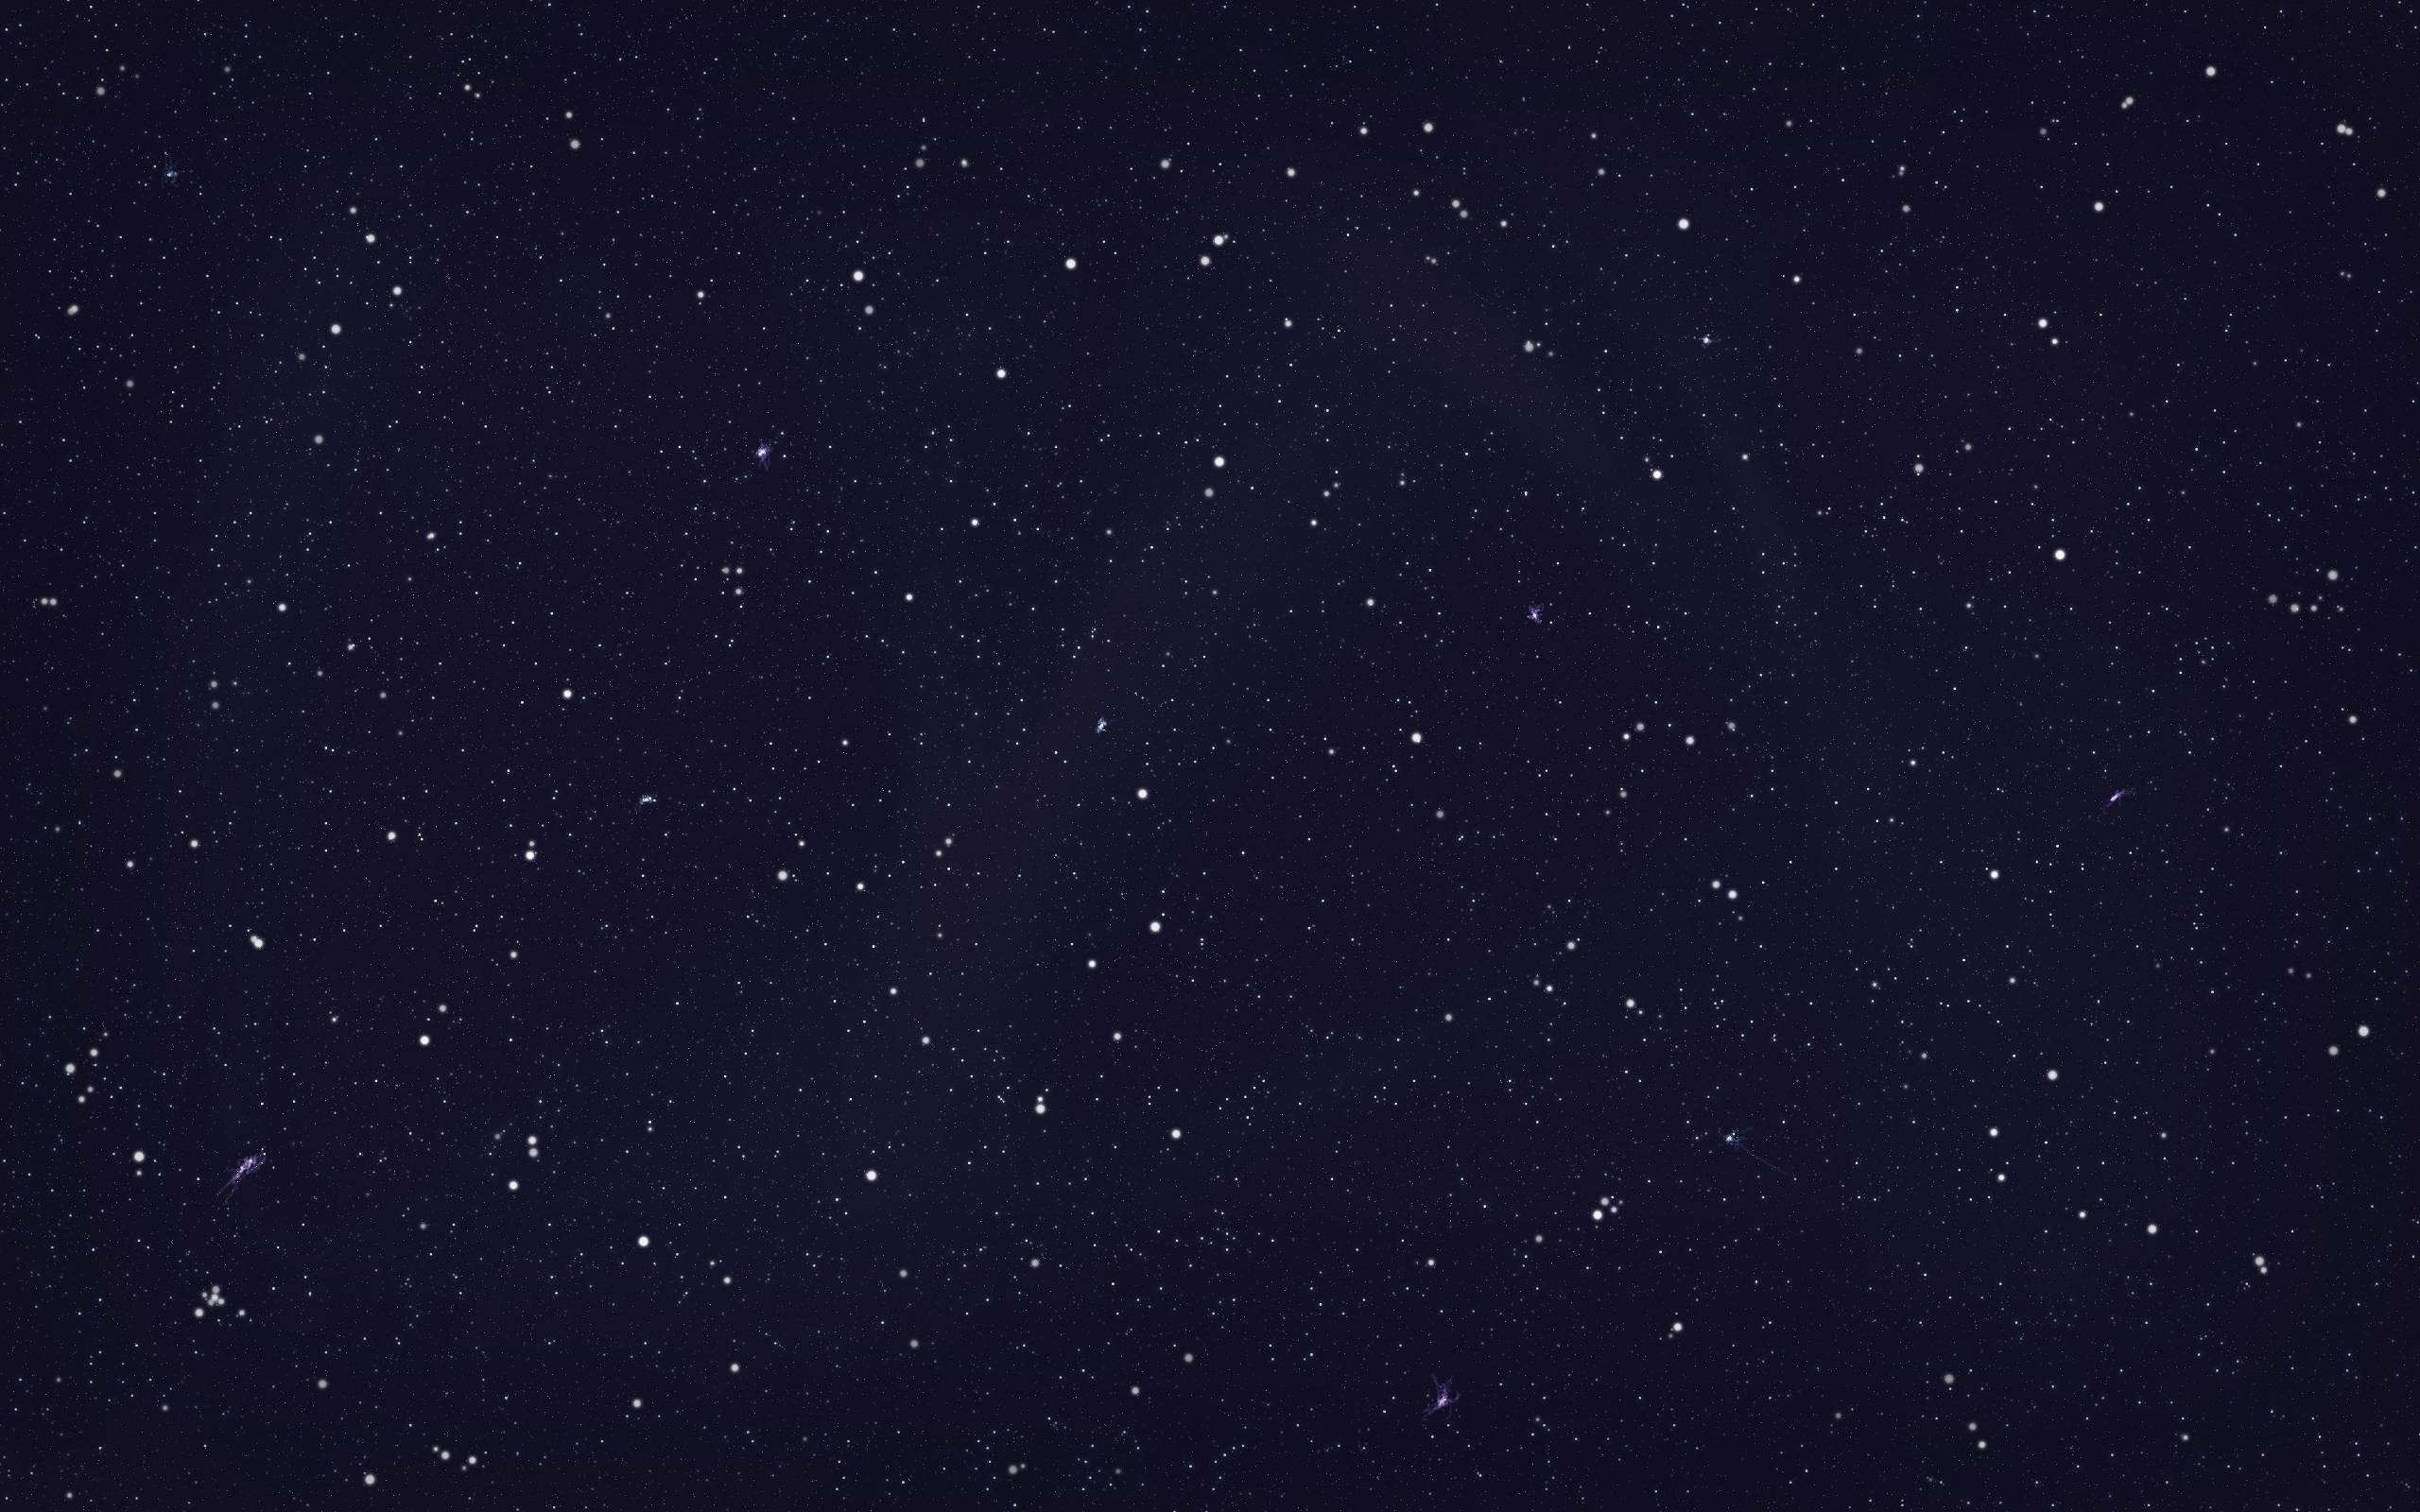 10 New Hd Space Backgrounds 1080p Full Hd 1080p For Pc Desktop: 10 Best Space Stars Wallpaper Hd FULL HD 1080p For PC Desktop